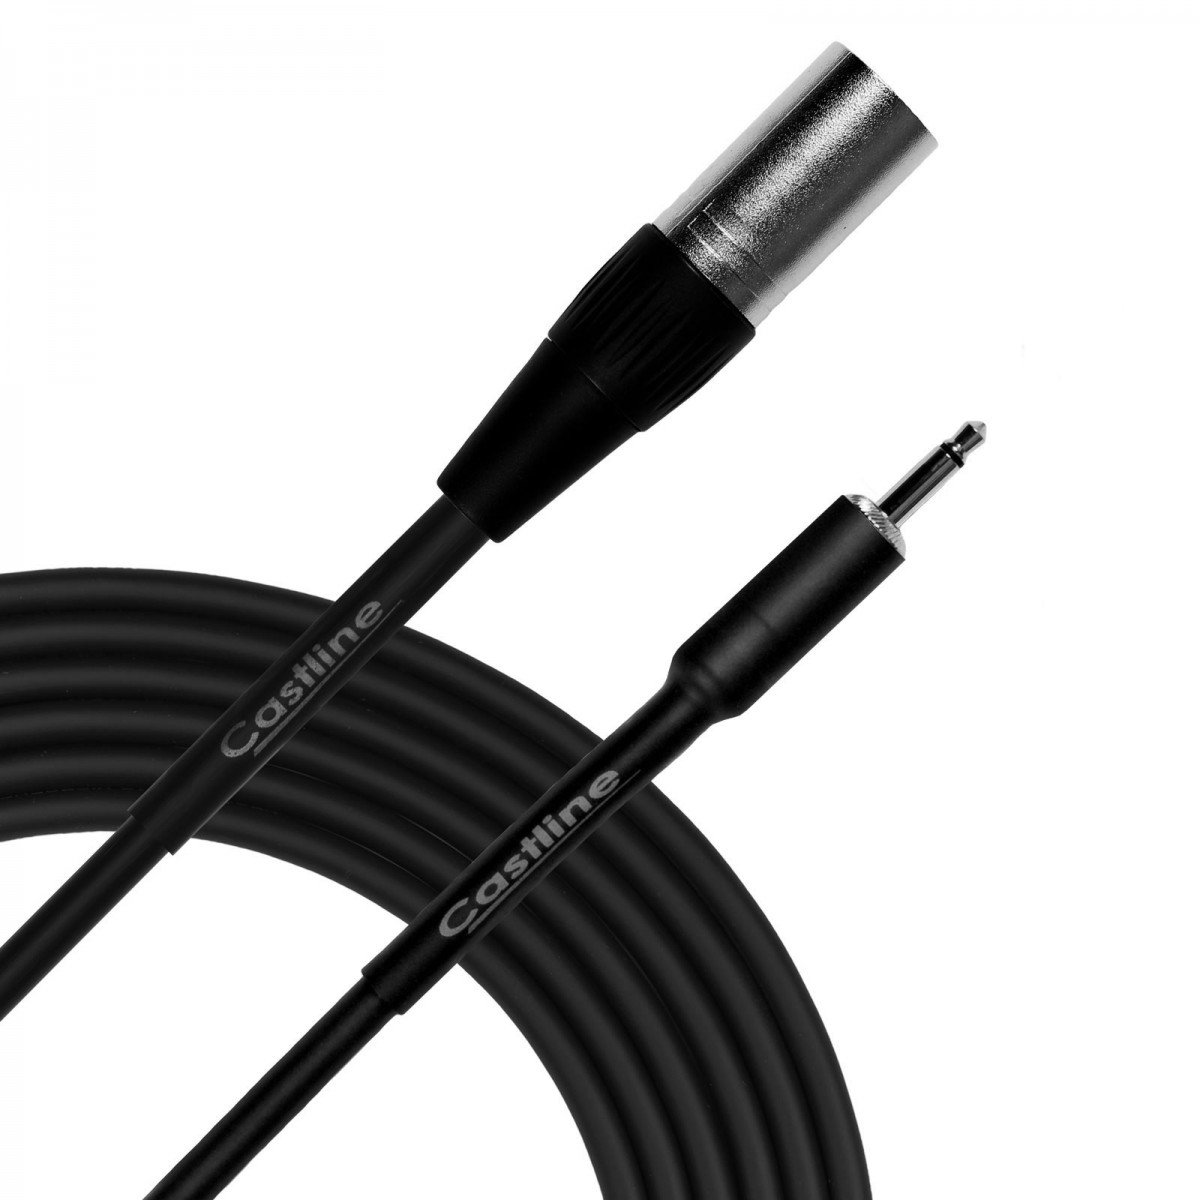 Amazon.com: 1 Ft Castline Silver XLR male to 3.5mm TS Patch ... on xlr jack wiring diagram, xlr to 1 4, xlr to tt, xlr to pc,